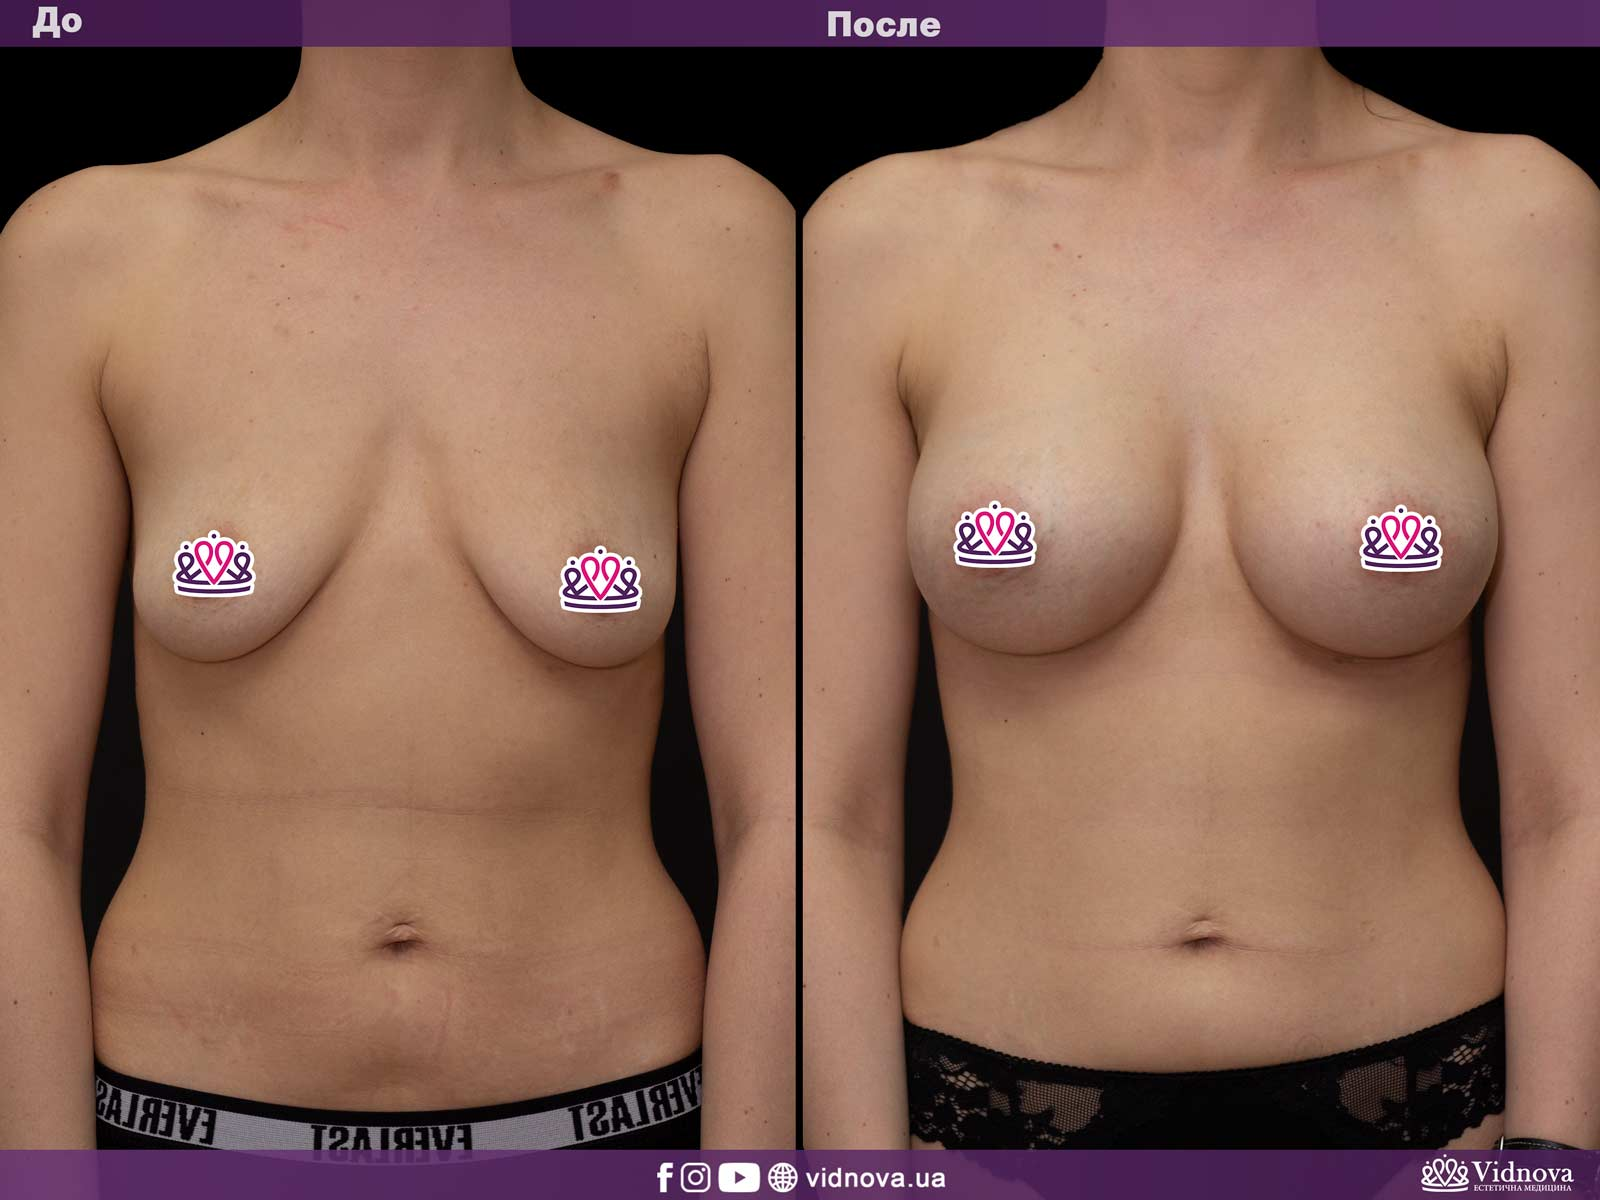 Увеличение груди: Фото ДО и ПОСЛЕ - Пример №18-1 - Клиника Vidnova